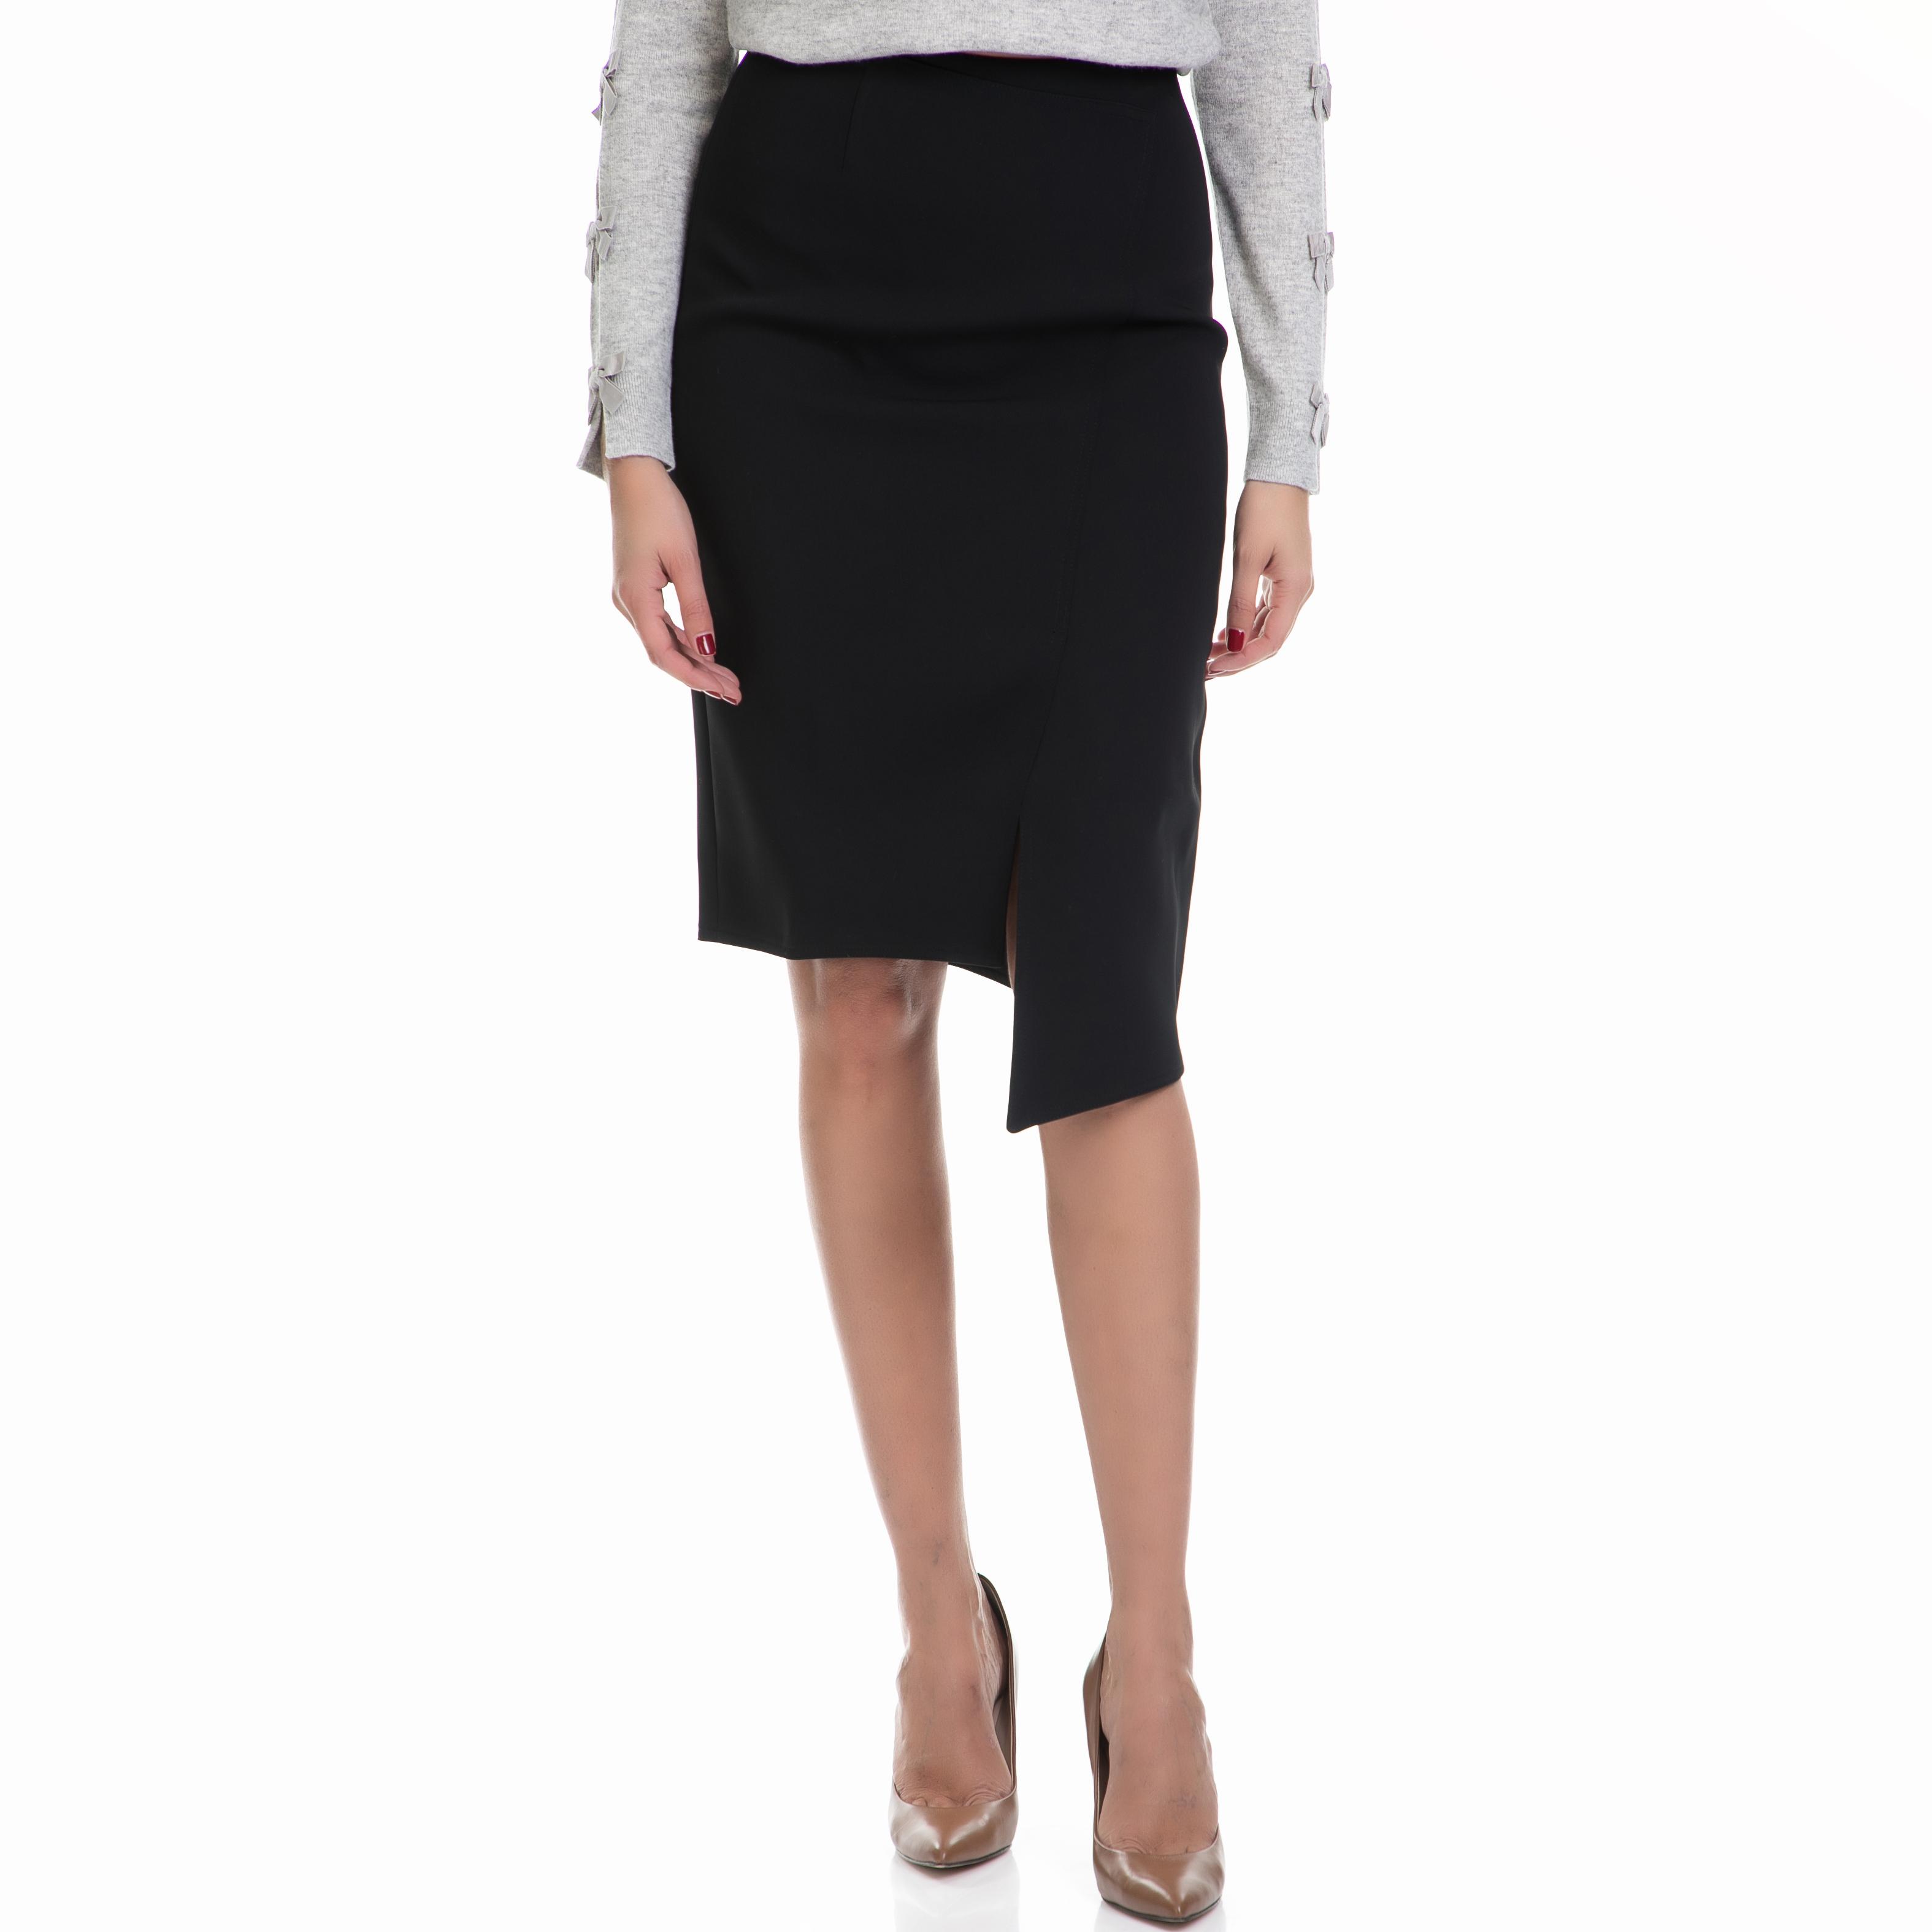 TED BAKER - Γυναικεία φούστα NIMMO TED BAKER μαύρη γυναικεία ρούχα φούστες μέχρι το γόνατο